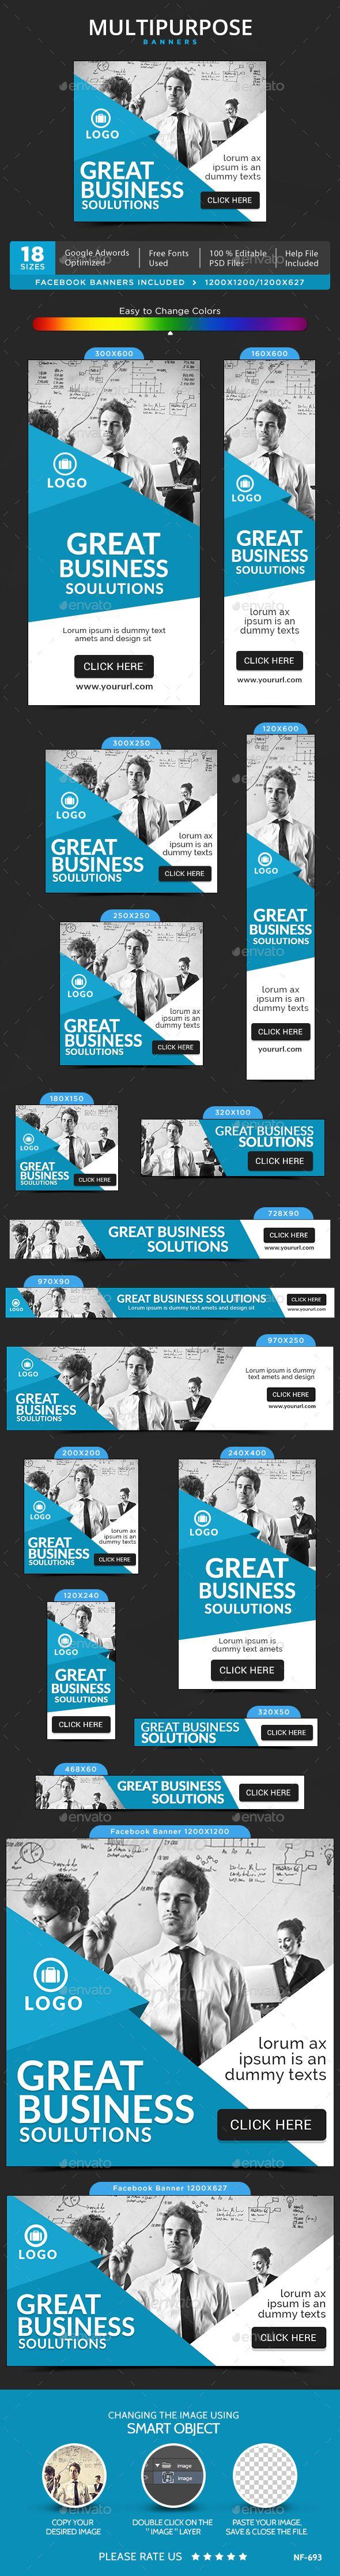 Multipurpose Banners Template #design #ad Download: http://graphicriver.net/item/multipurpose-banners/13112767?ref=ksioks